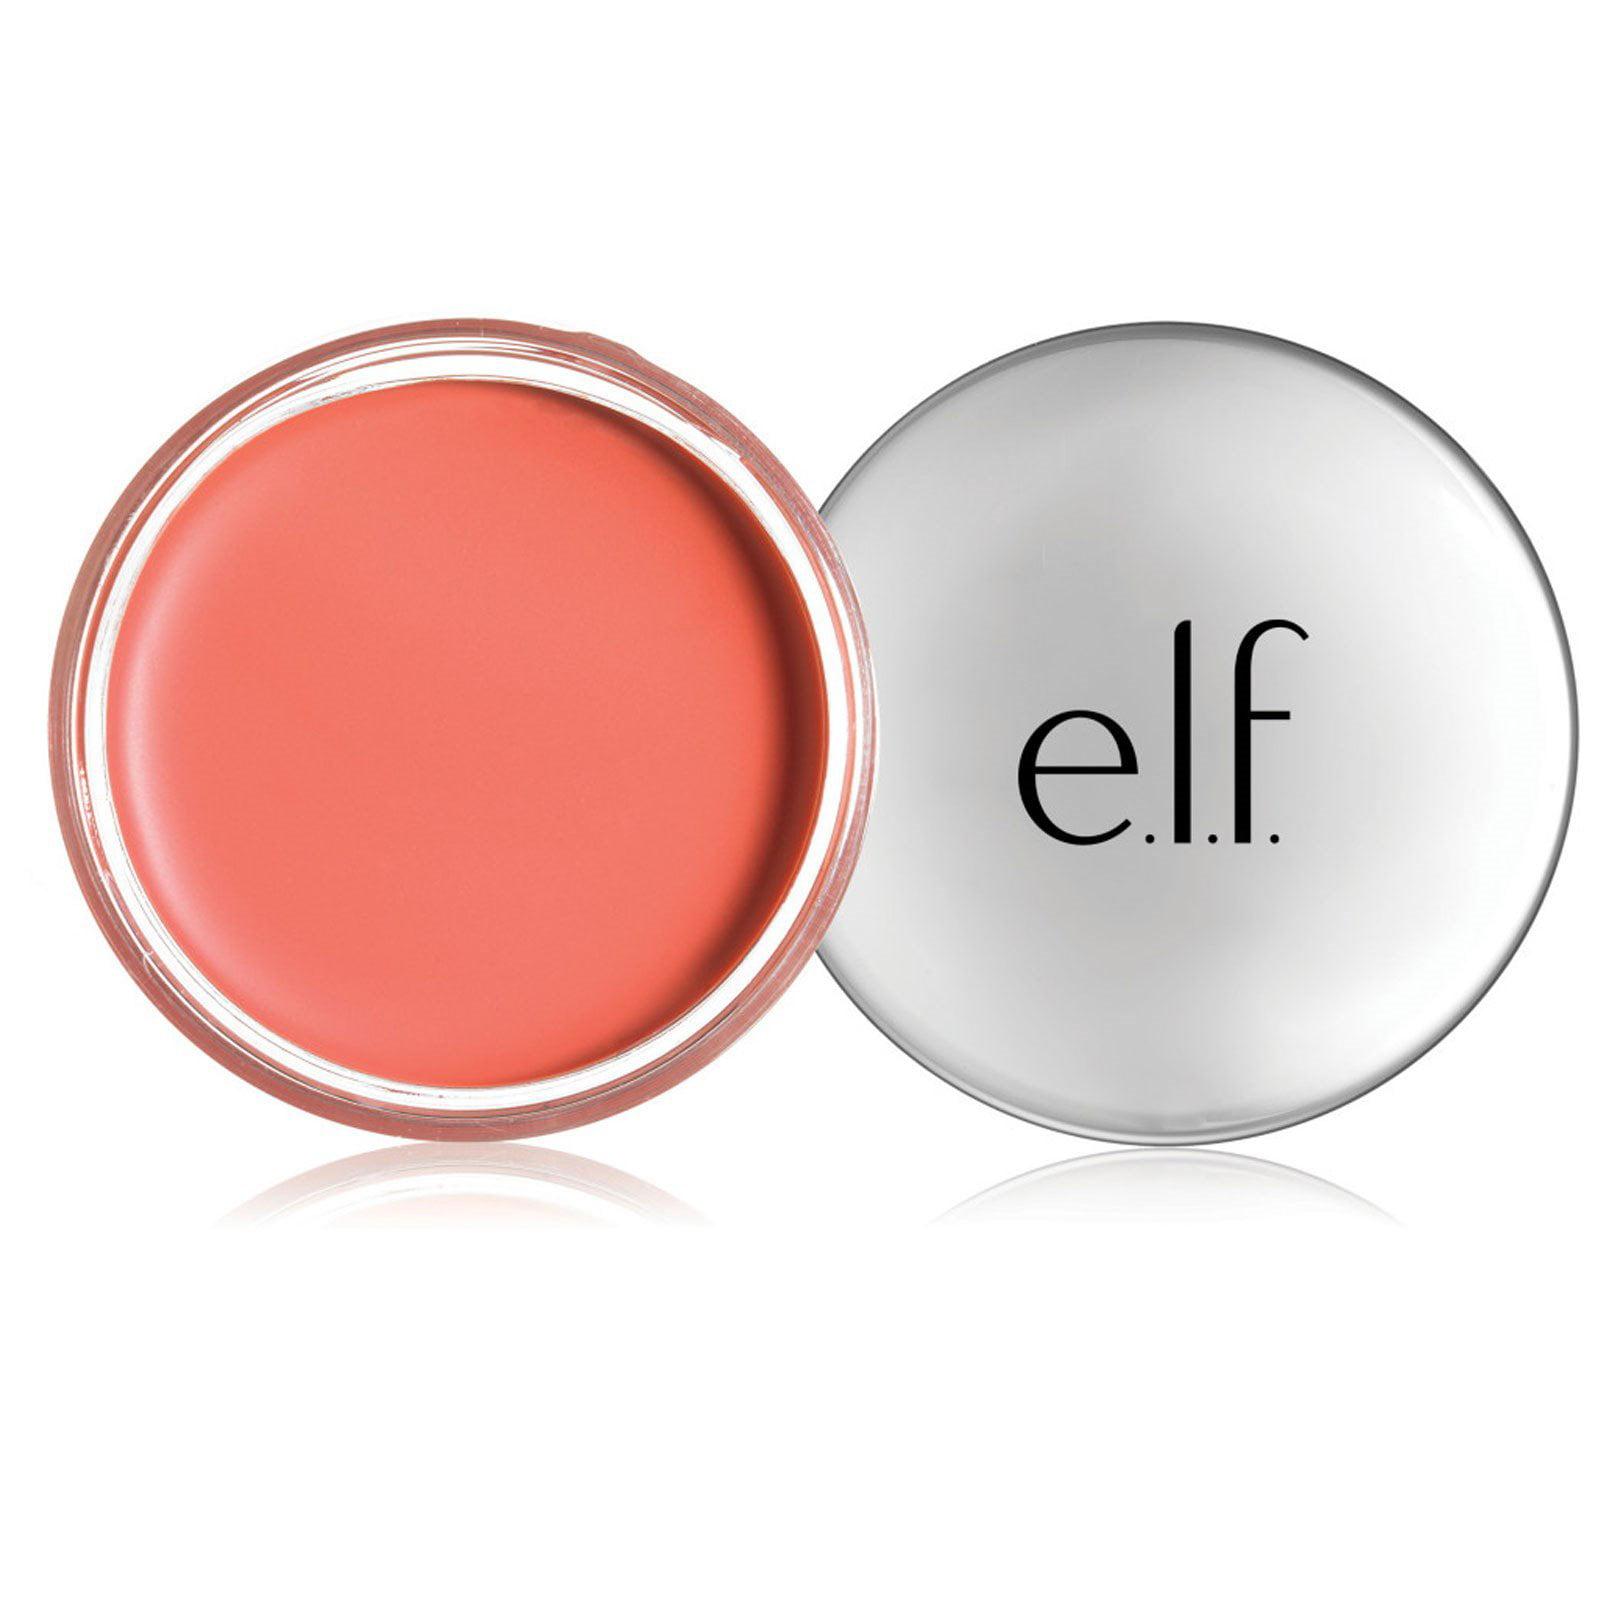 E.L.F. Cosmetics, Beautifully Bare, Blush, Rose Royalty, 0.35 oz (pack of 1)